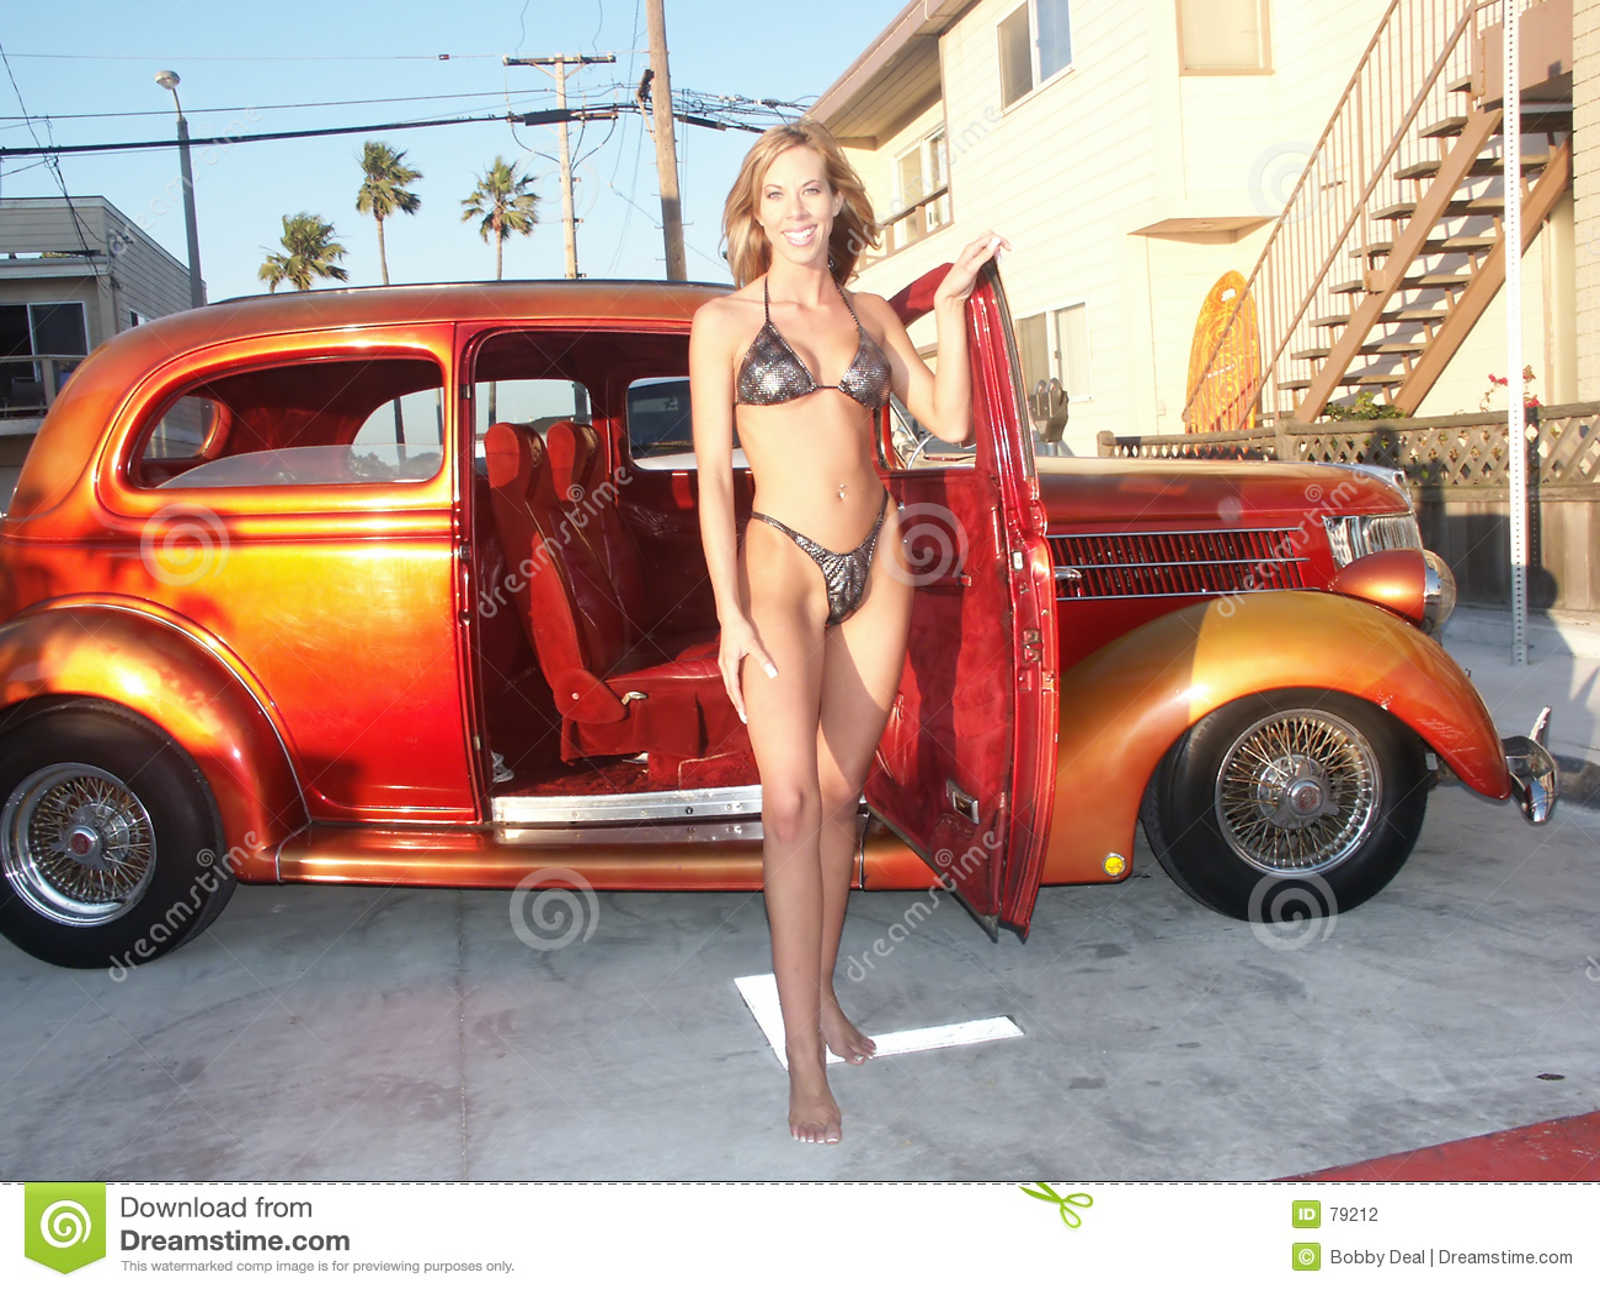 Andrea-Bikini 5